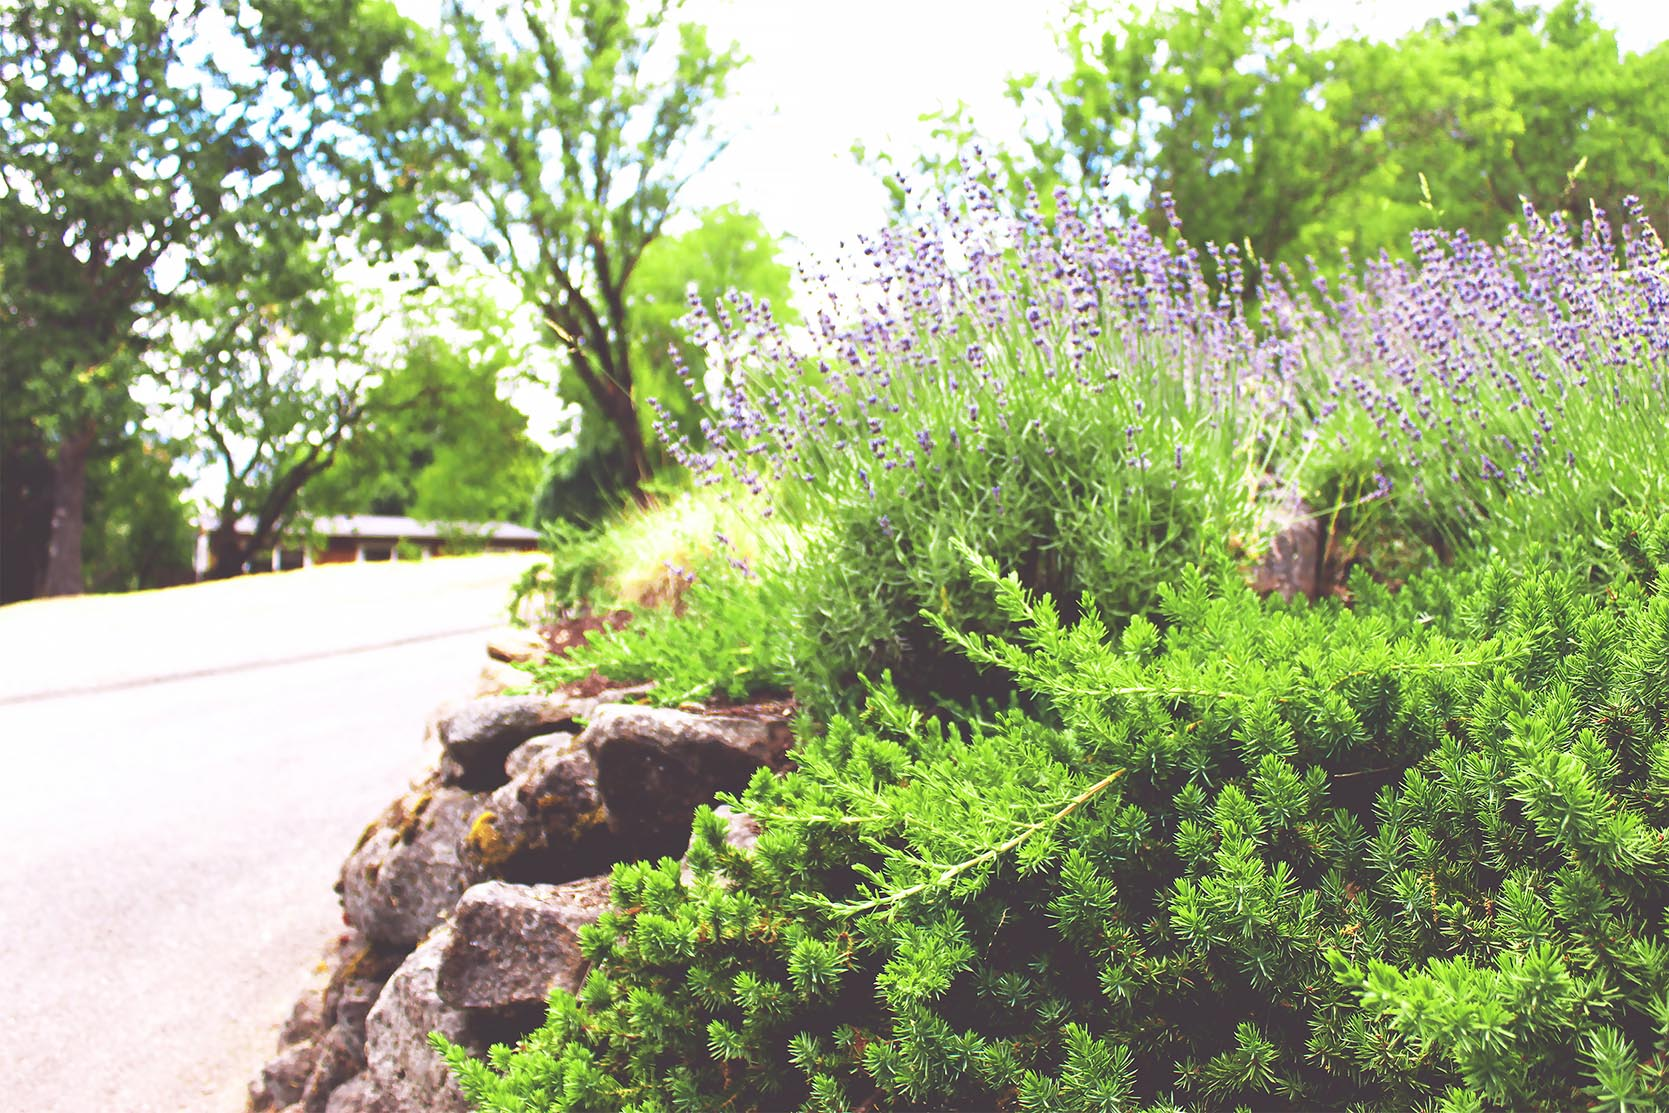 Rock Wall + Driveway Edge + Drought Tolerant Plants + Creeping Rosemary + Lavender